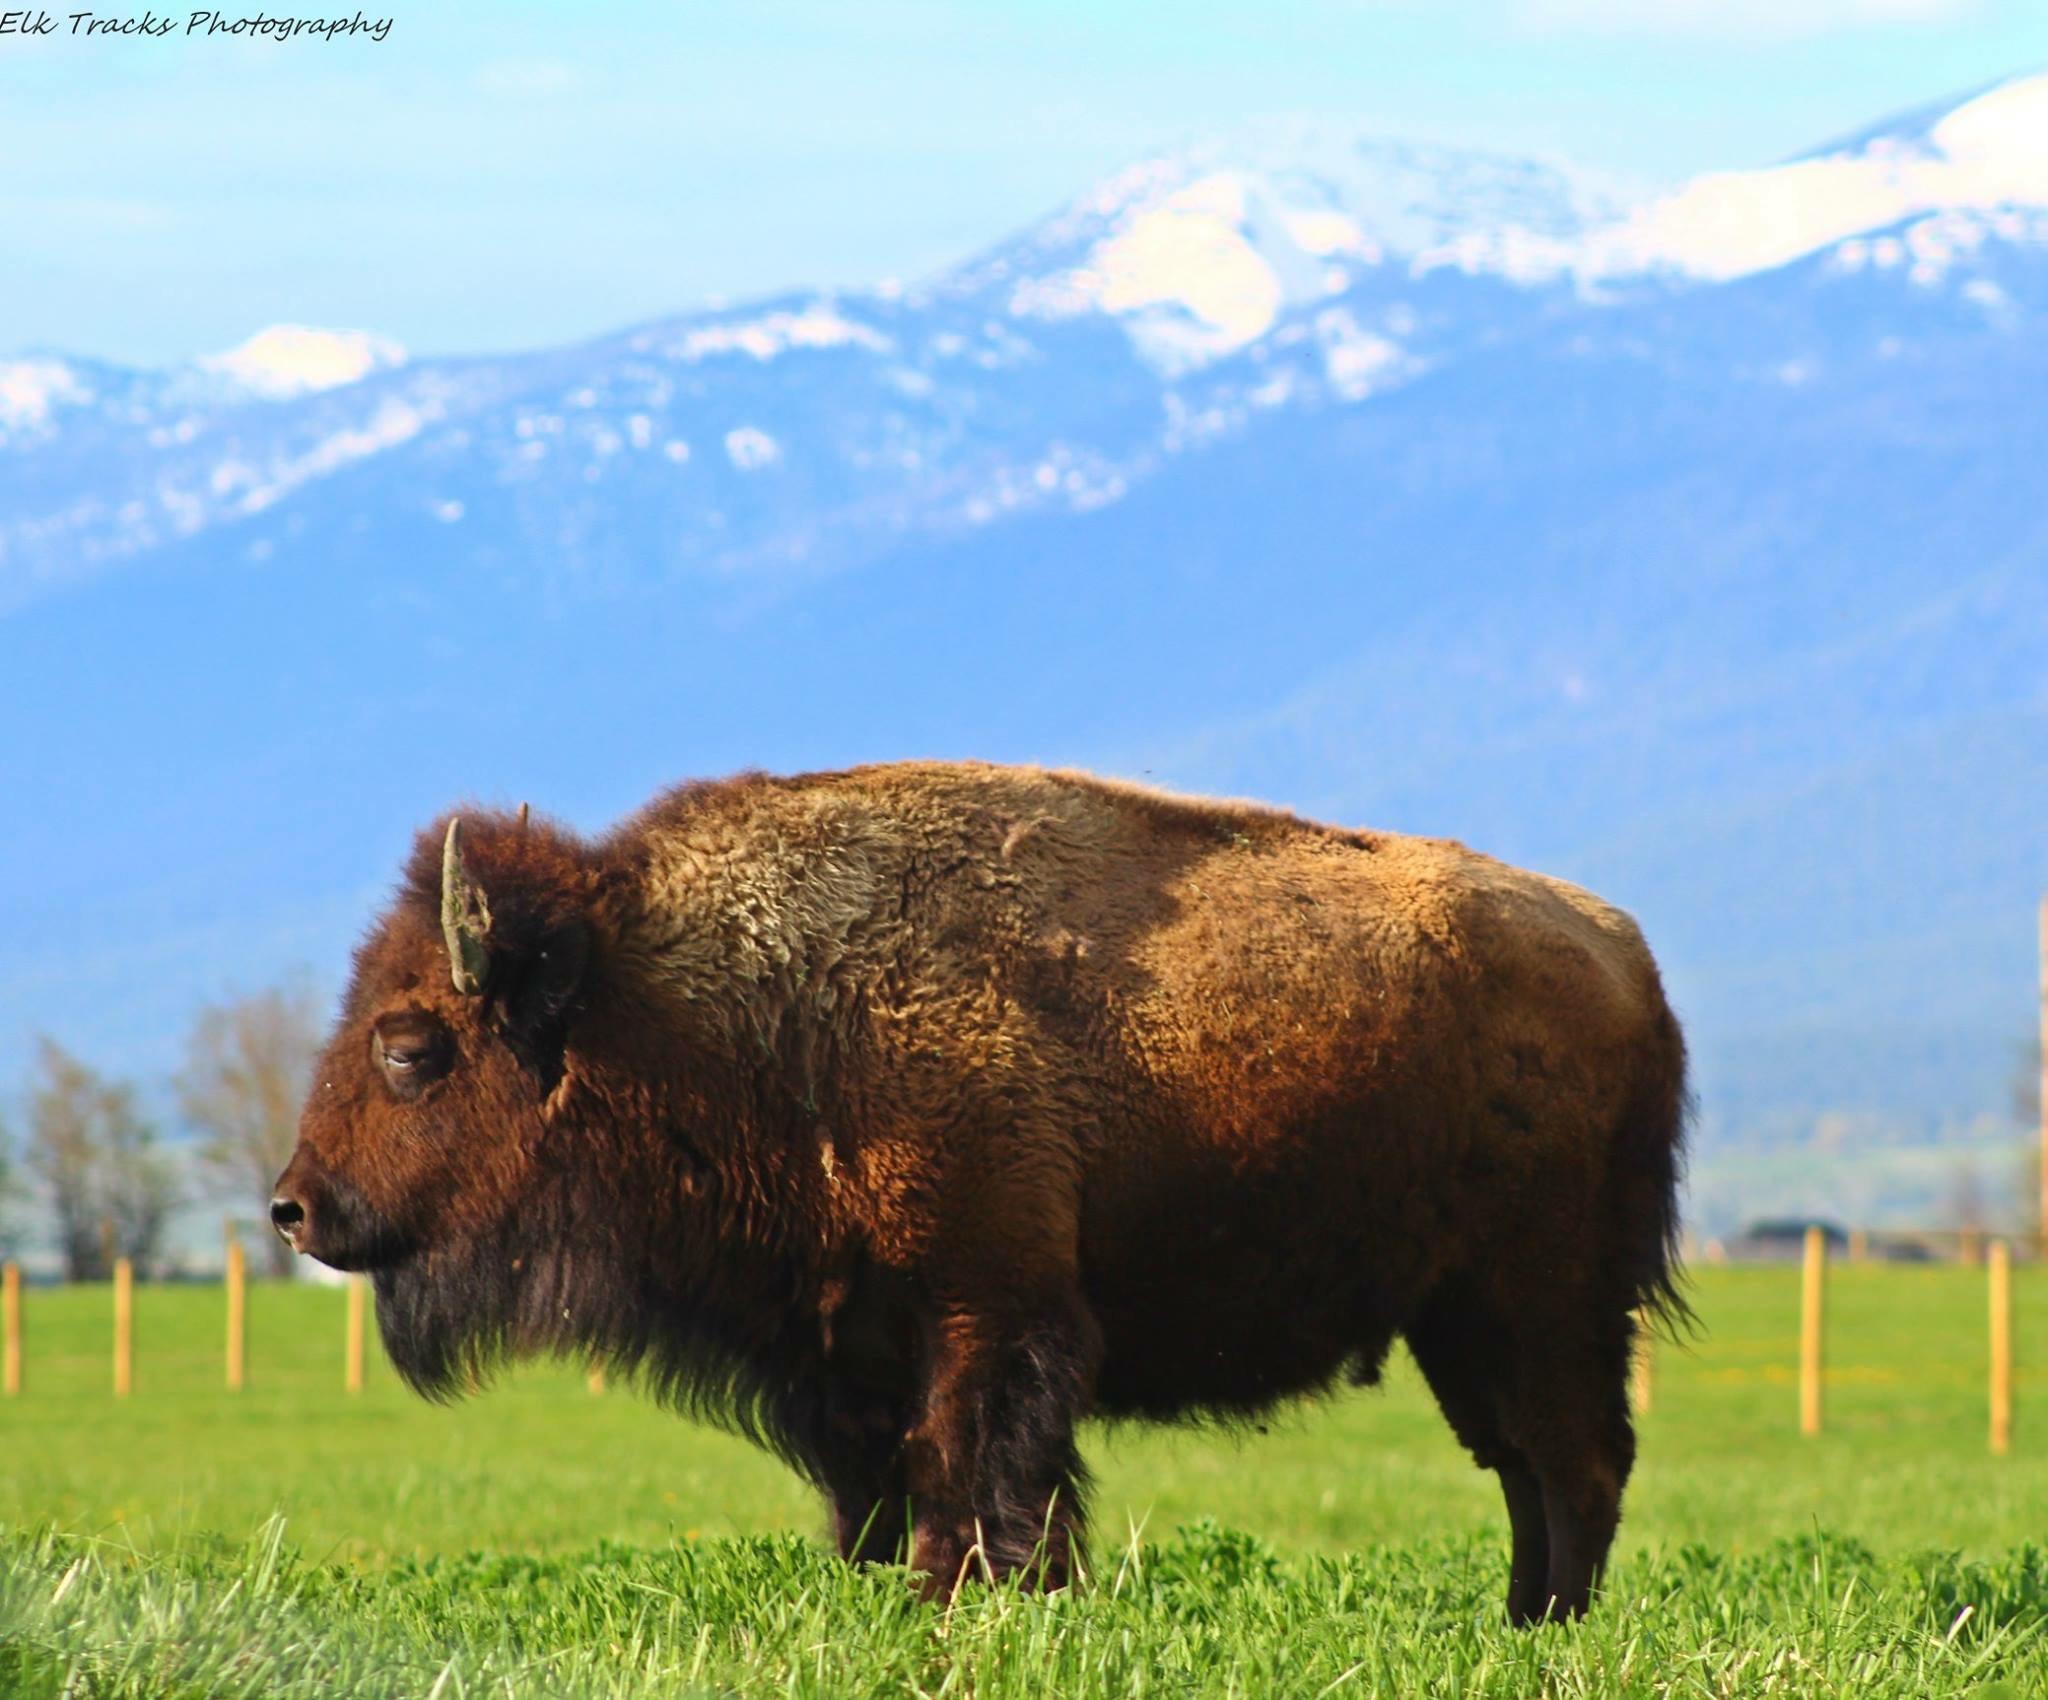 Grass Fed Bison Cow Enjoying The Sunshine